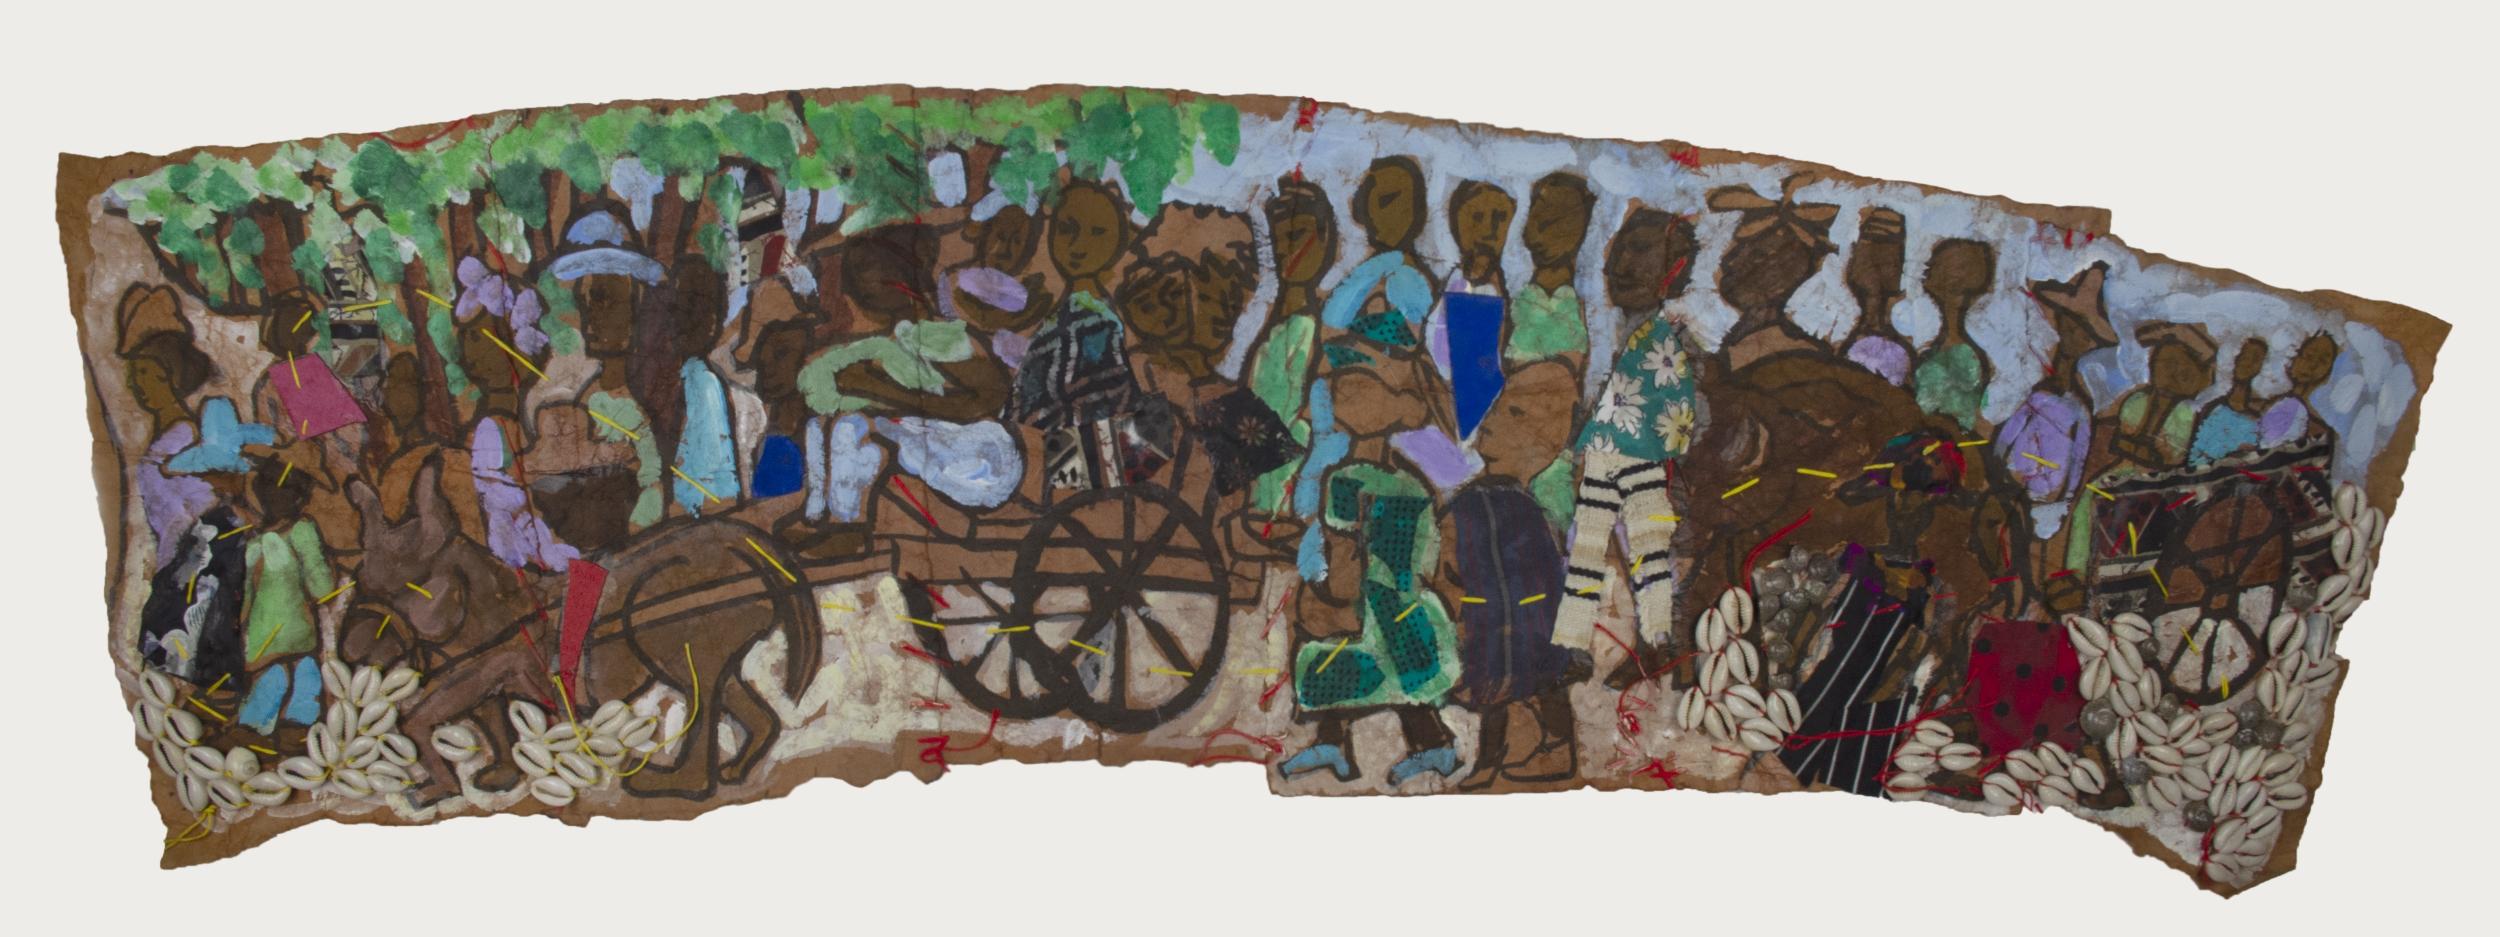 Aminah-Robinson-Untitled-Migration